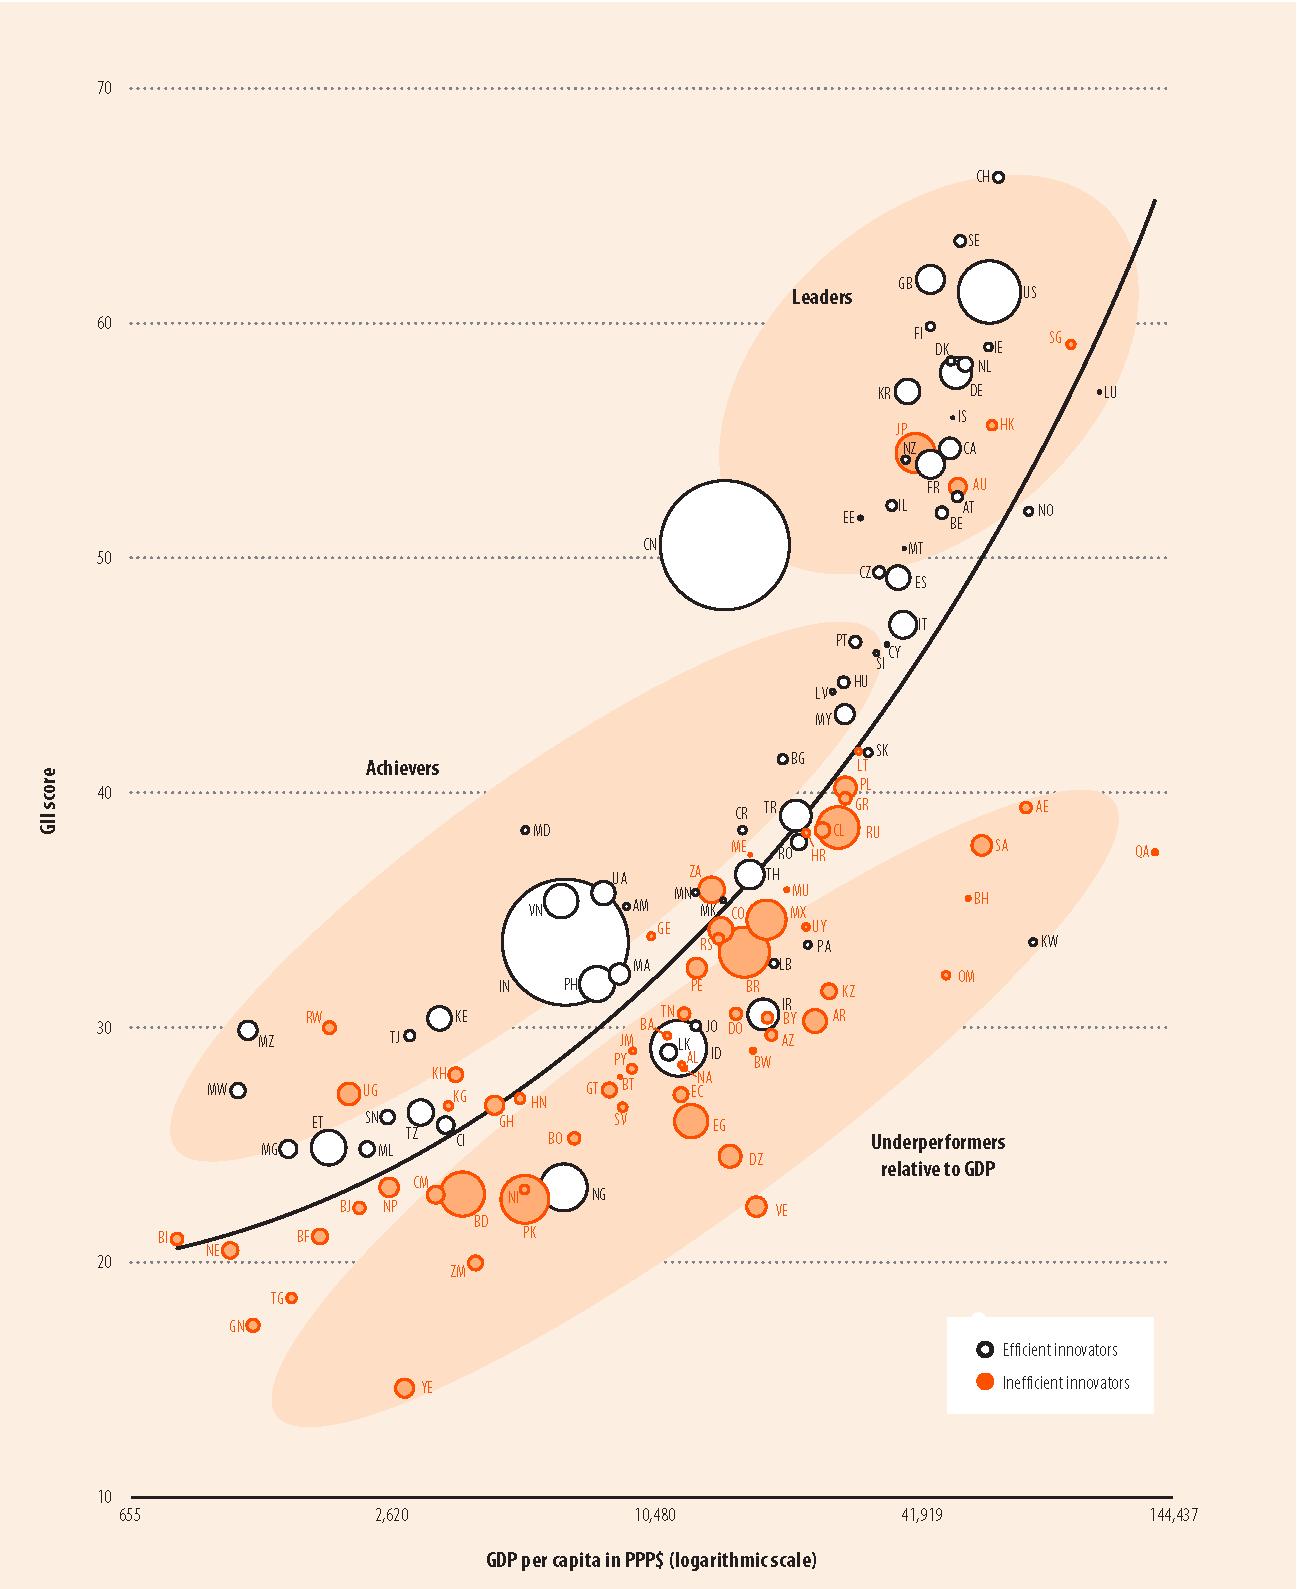 Страницы из Global Innovation Index 16